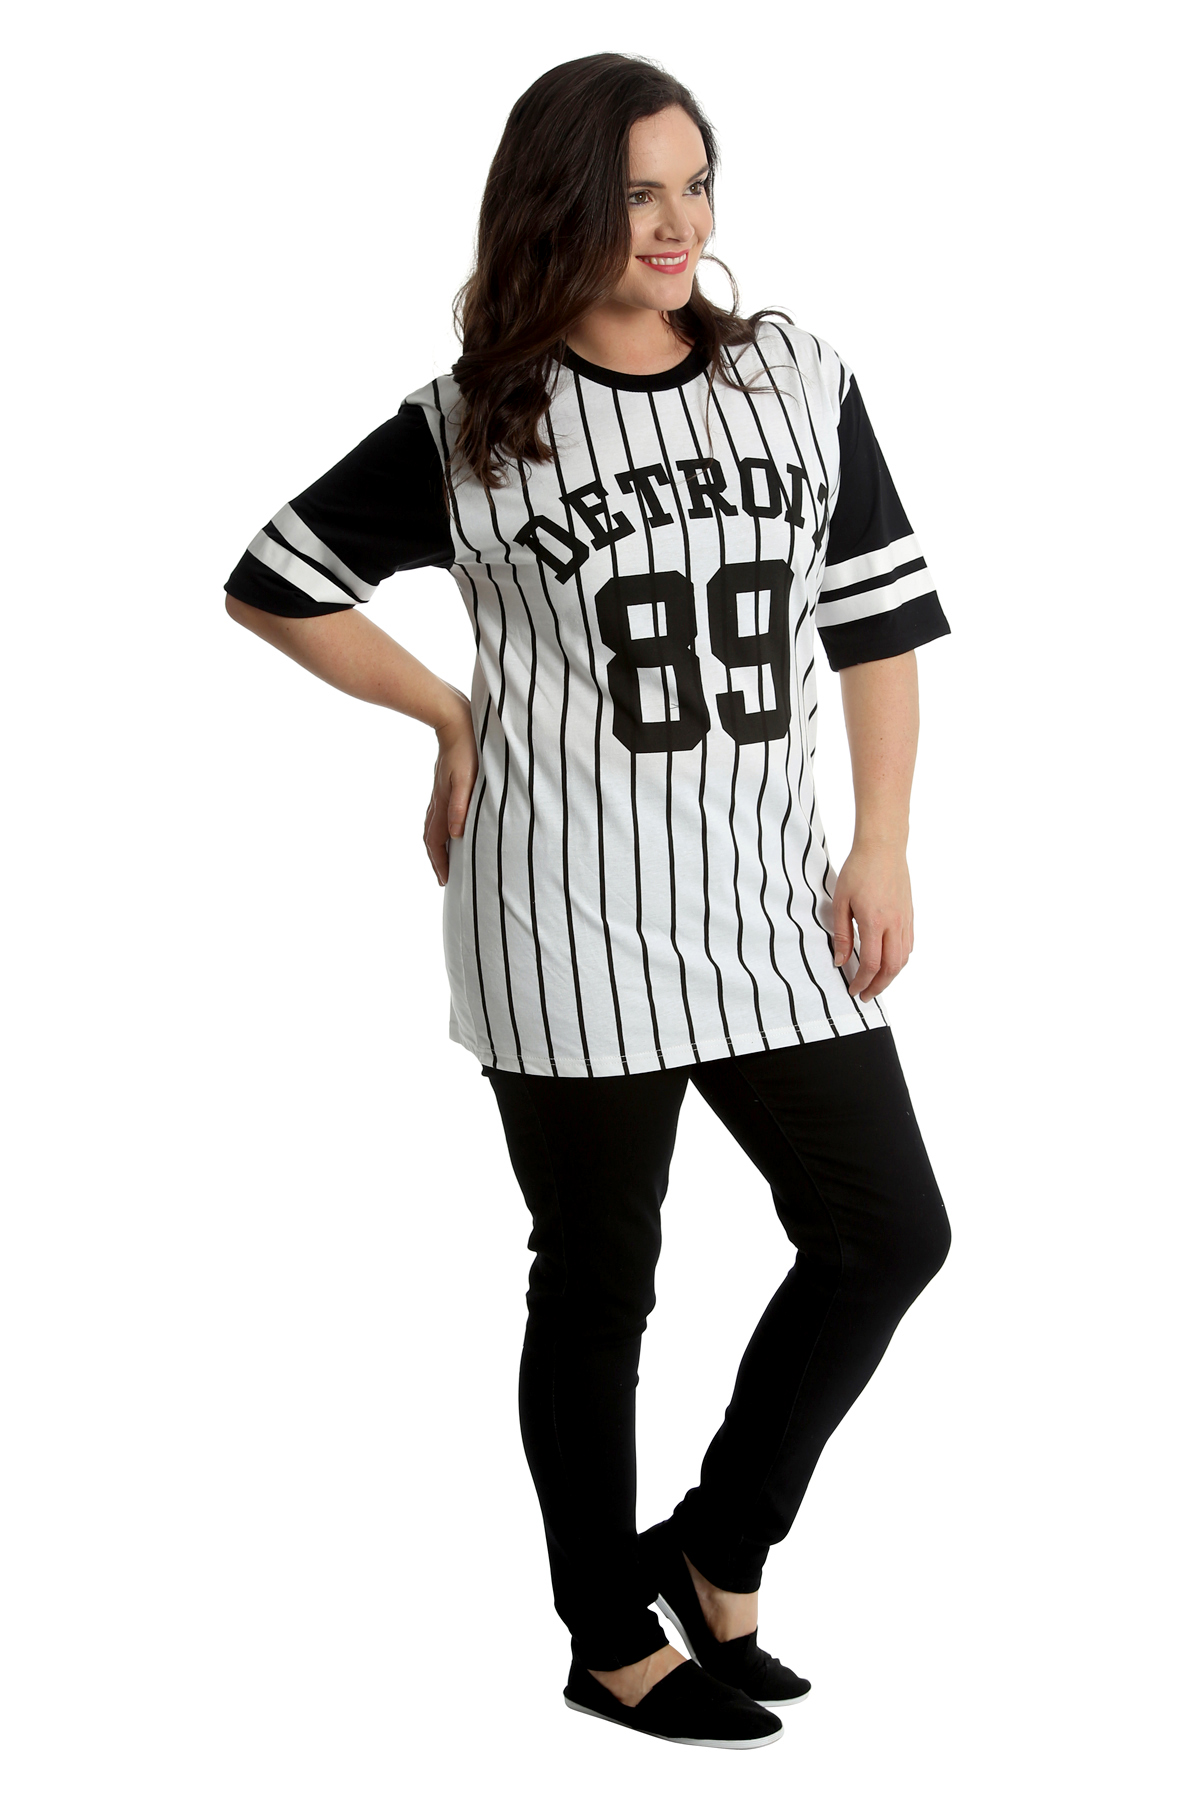 Neu Damen Übergröße T-Shirt Frau Uni Baseball Hemd Detroit 89 Top Sale Nouvelle